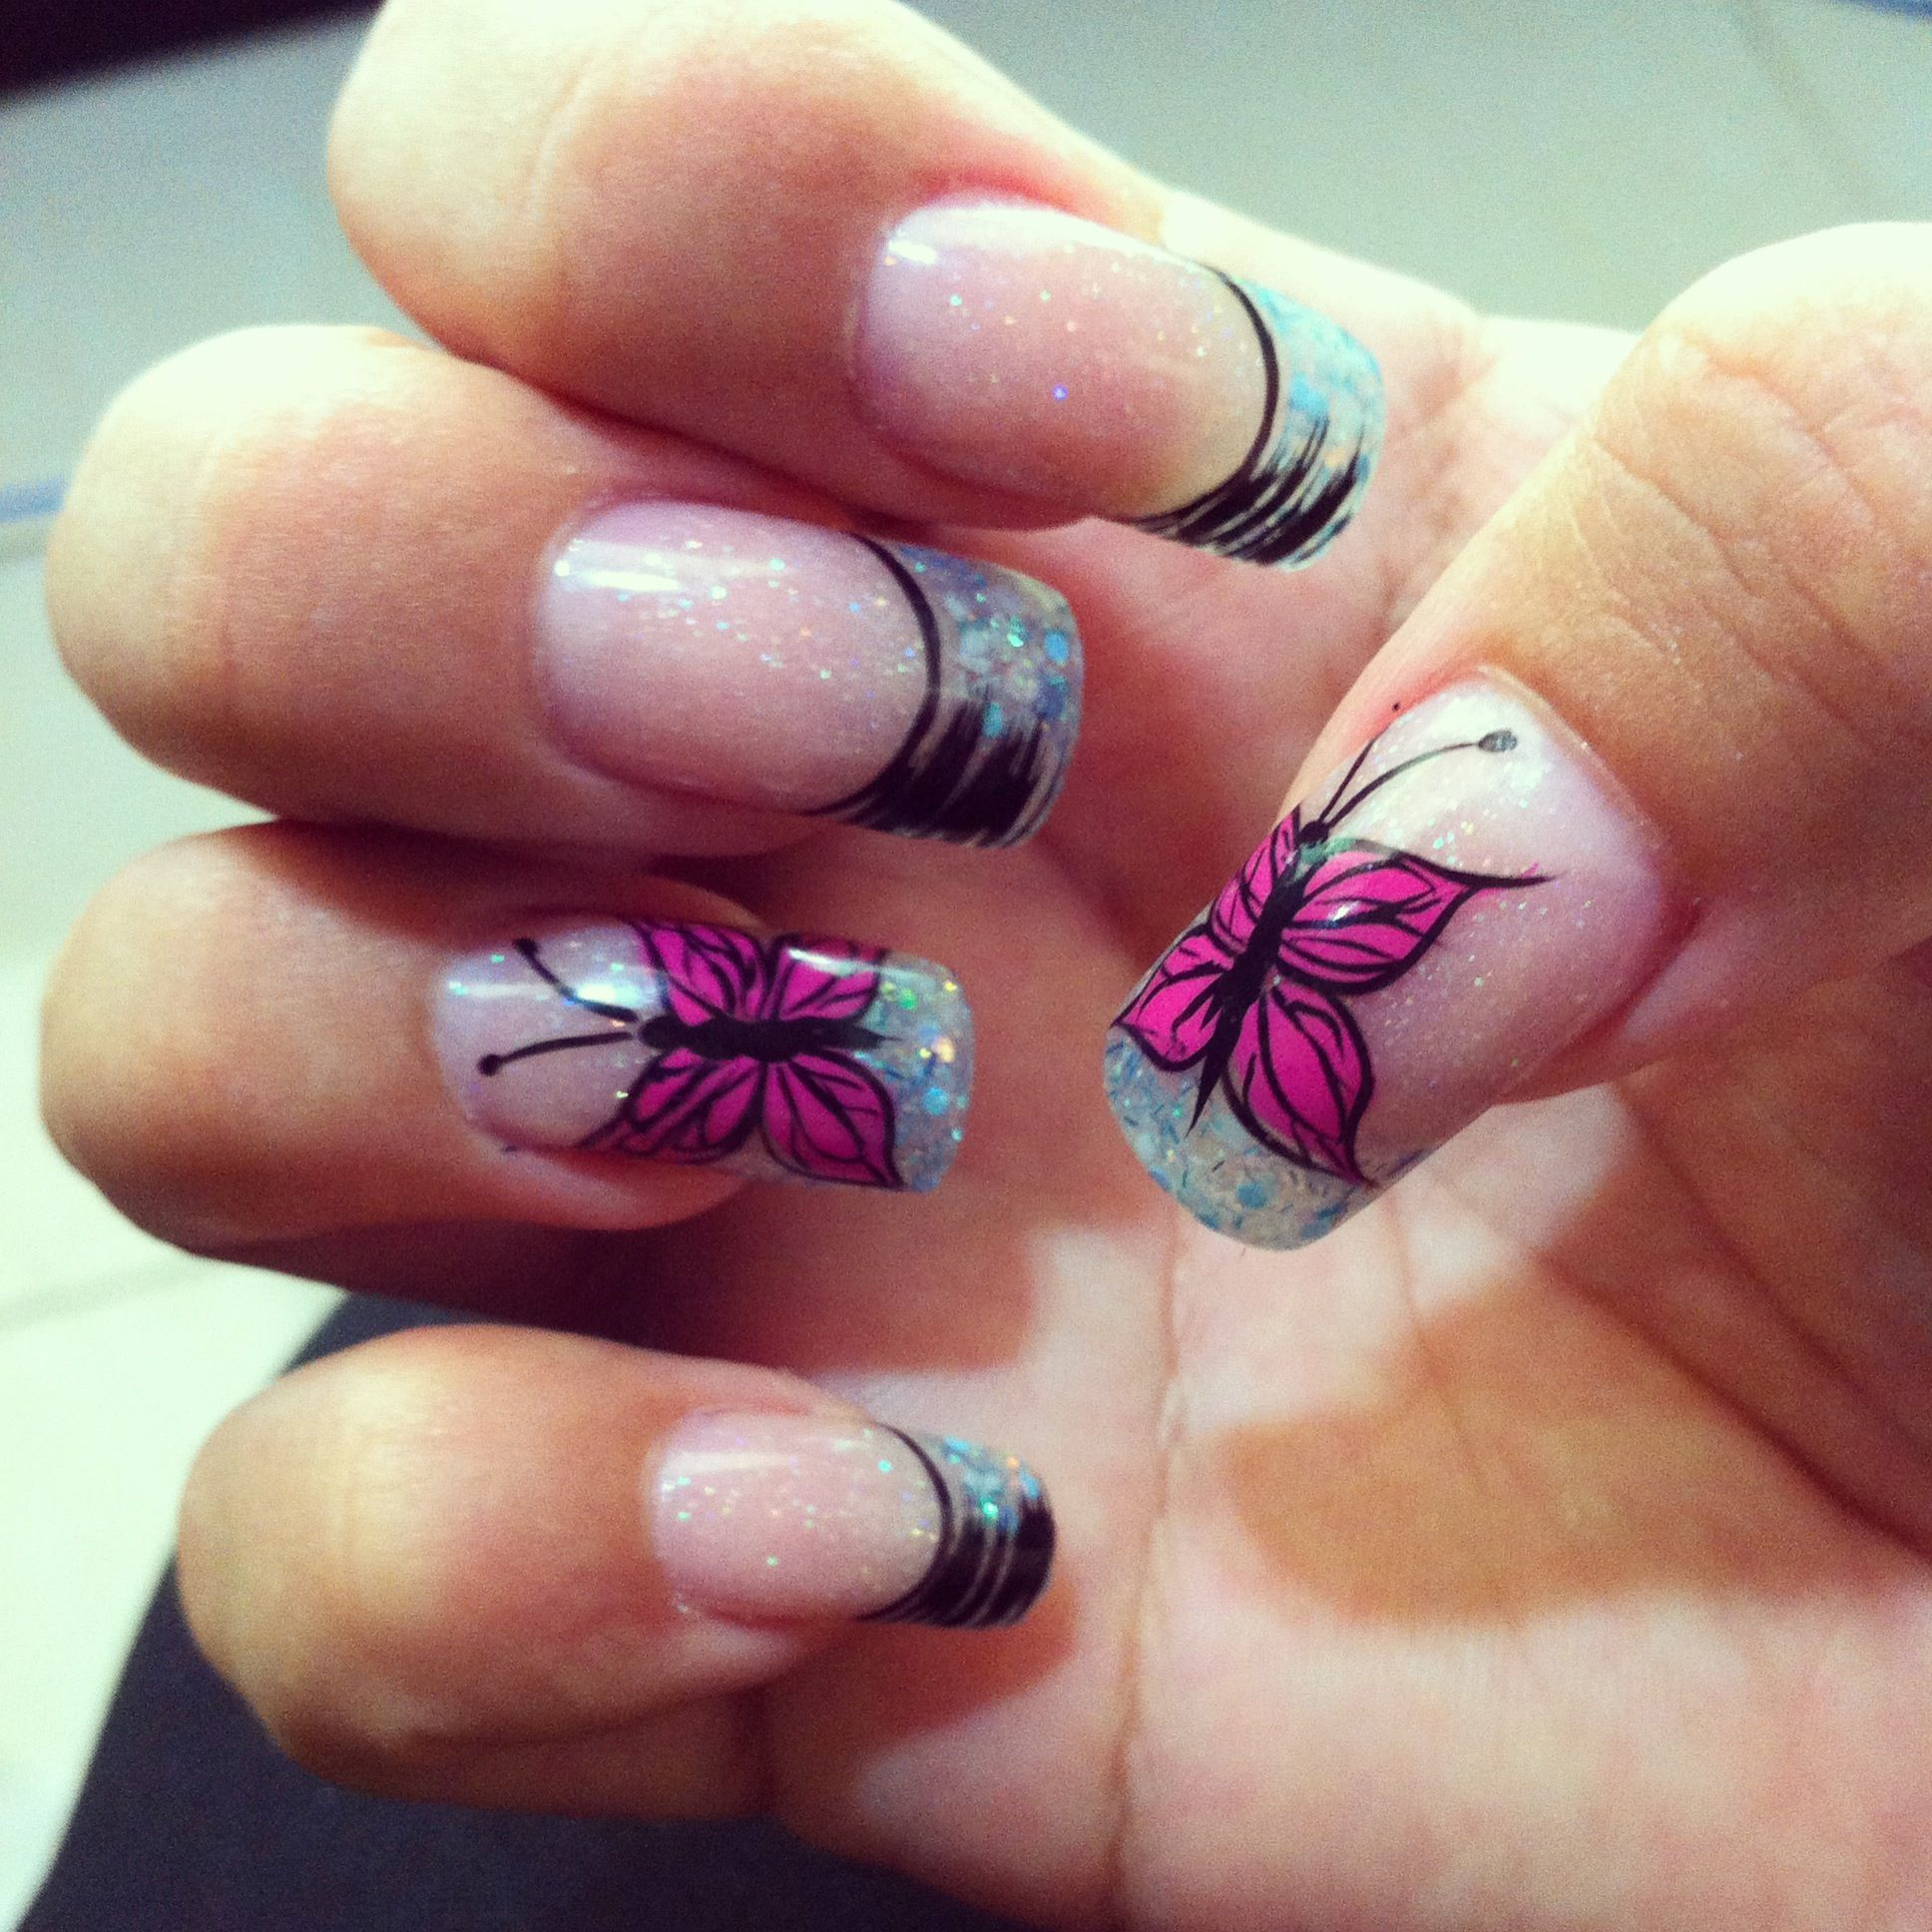 nailart #butterfly #colors diseños uñas coloridas | My Nails designs ...